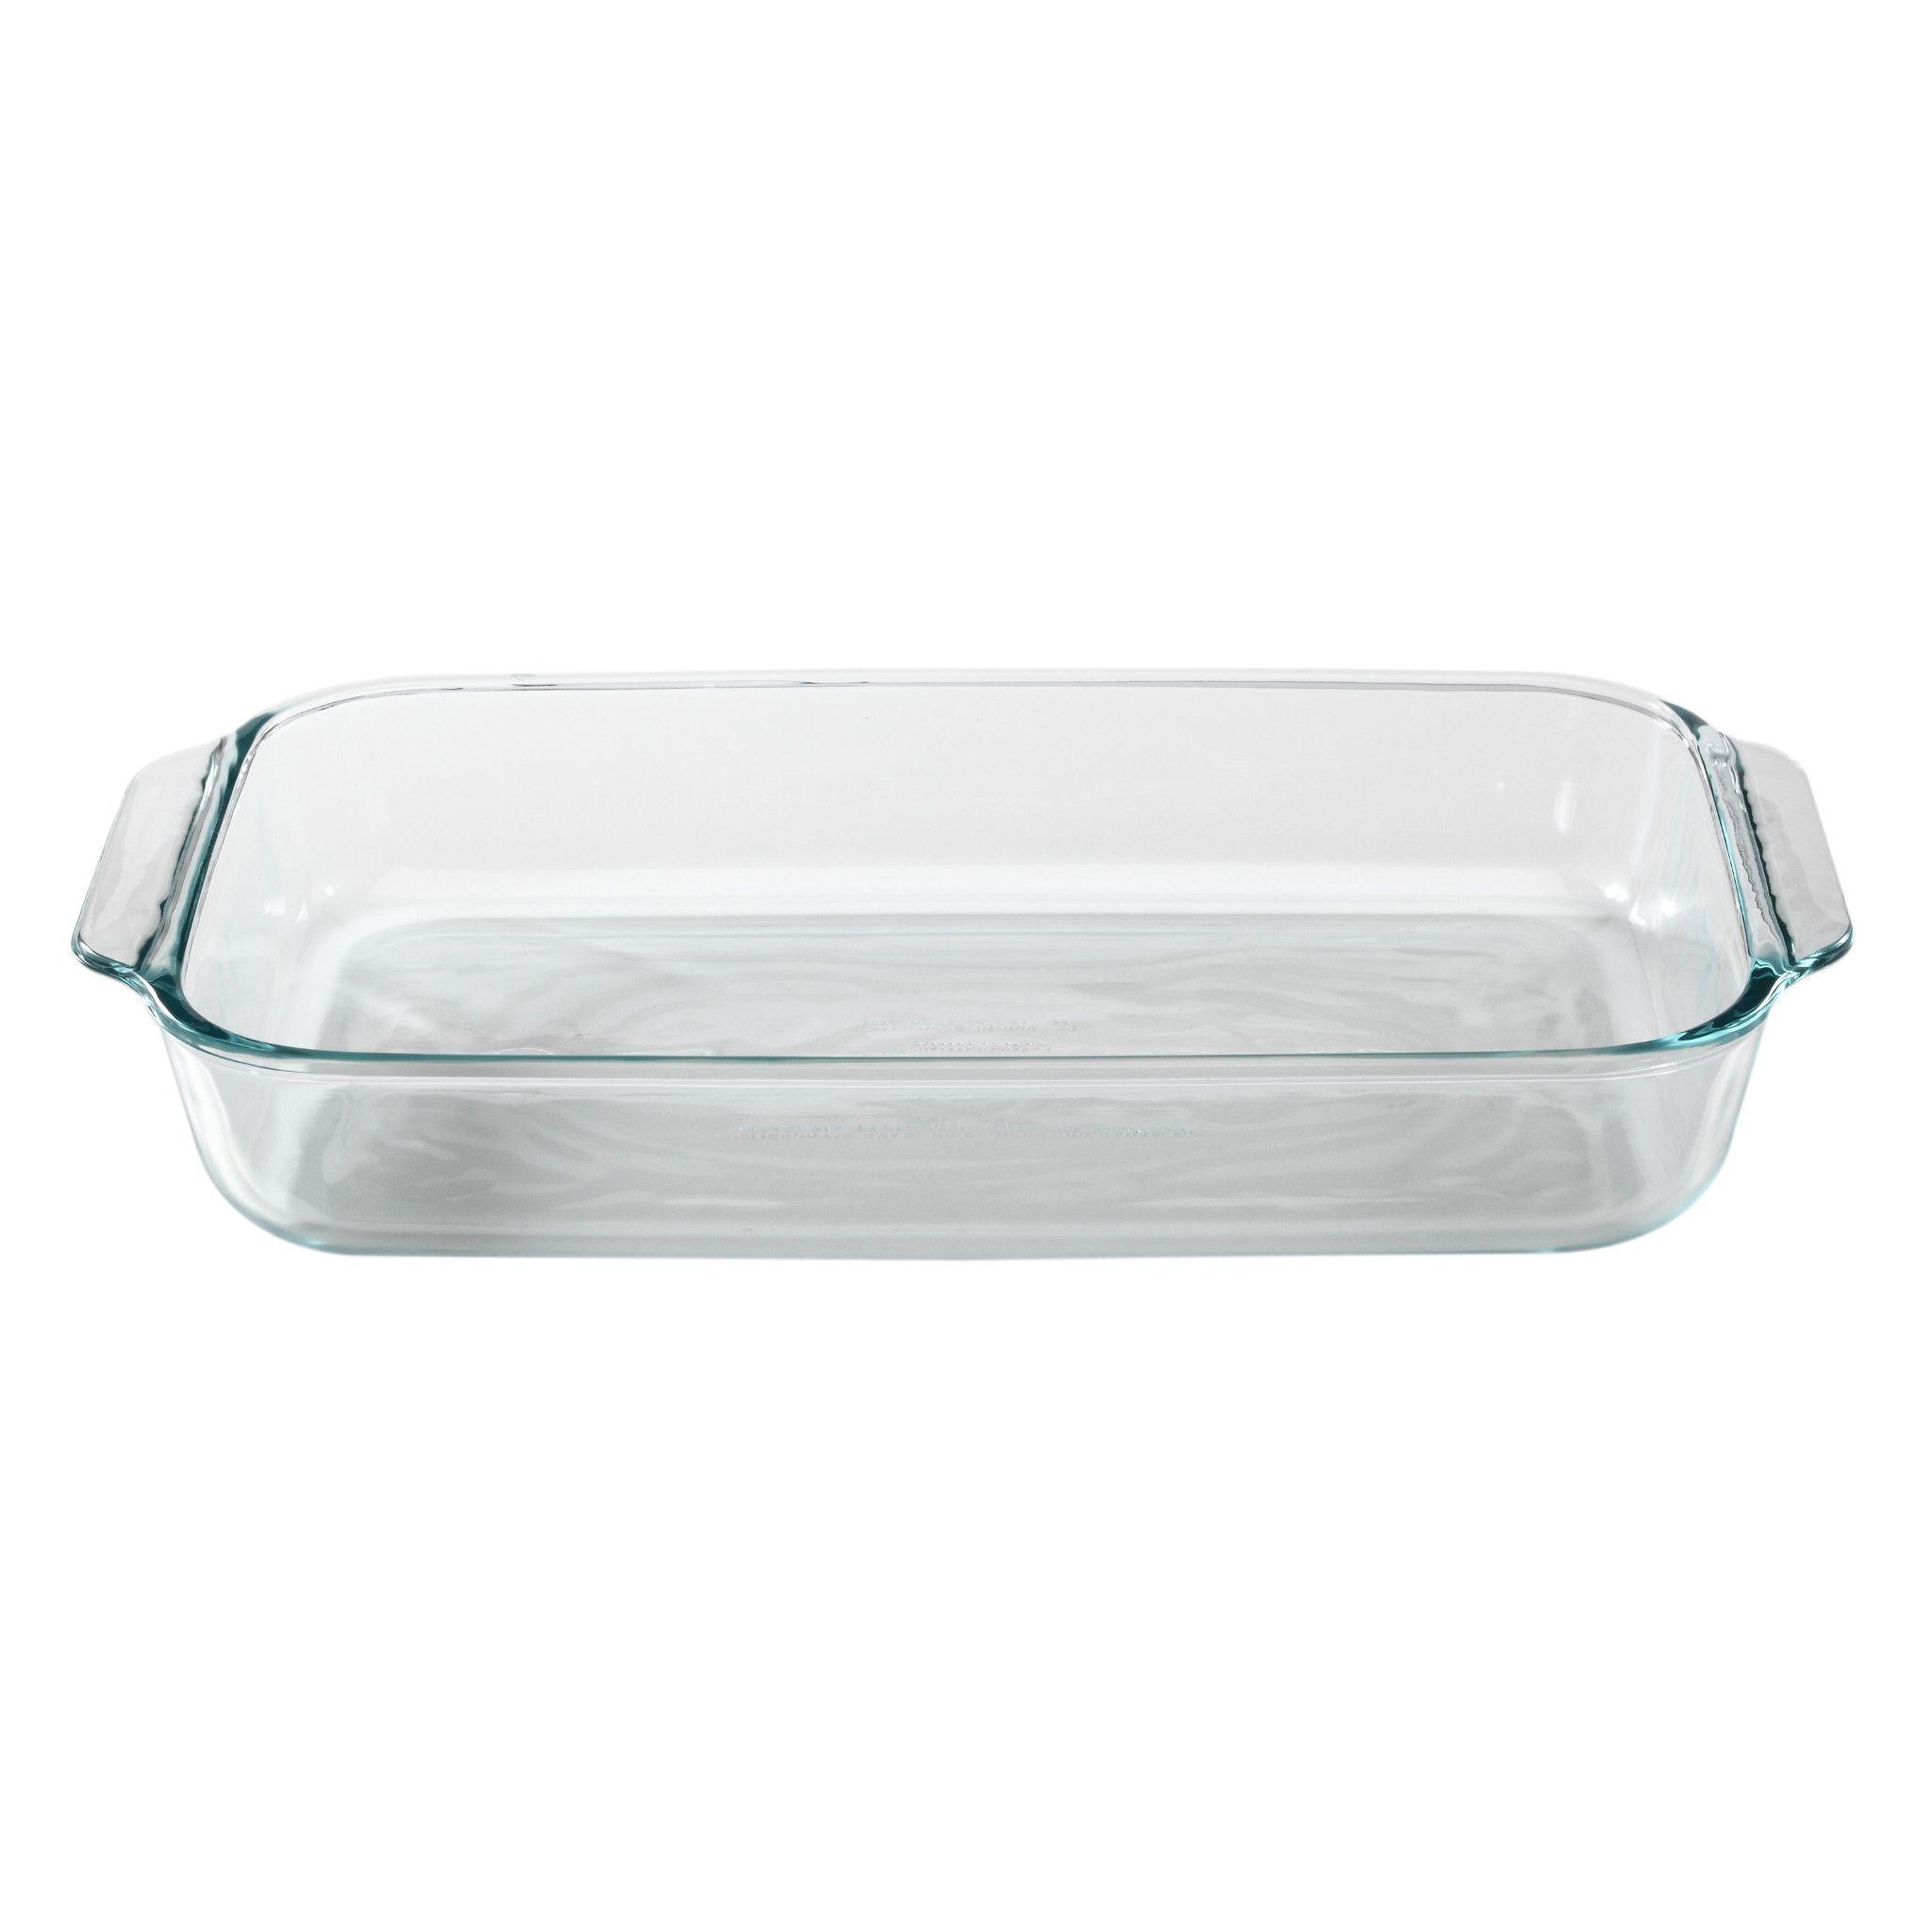 Pyrex Basics Glass Bakeware 3-Quart Baking Dish